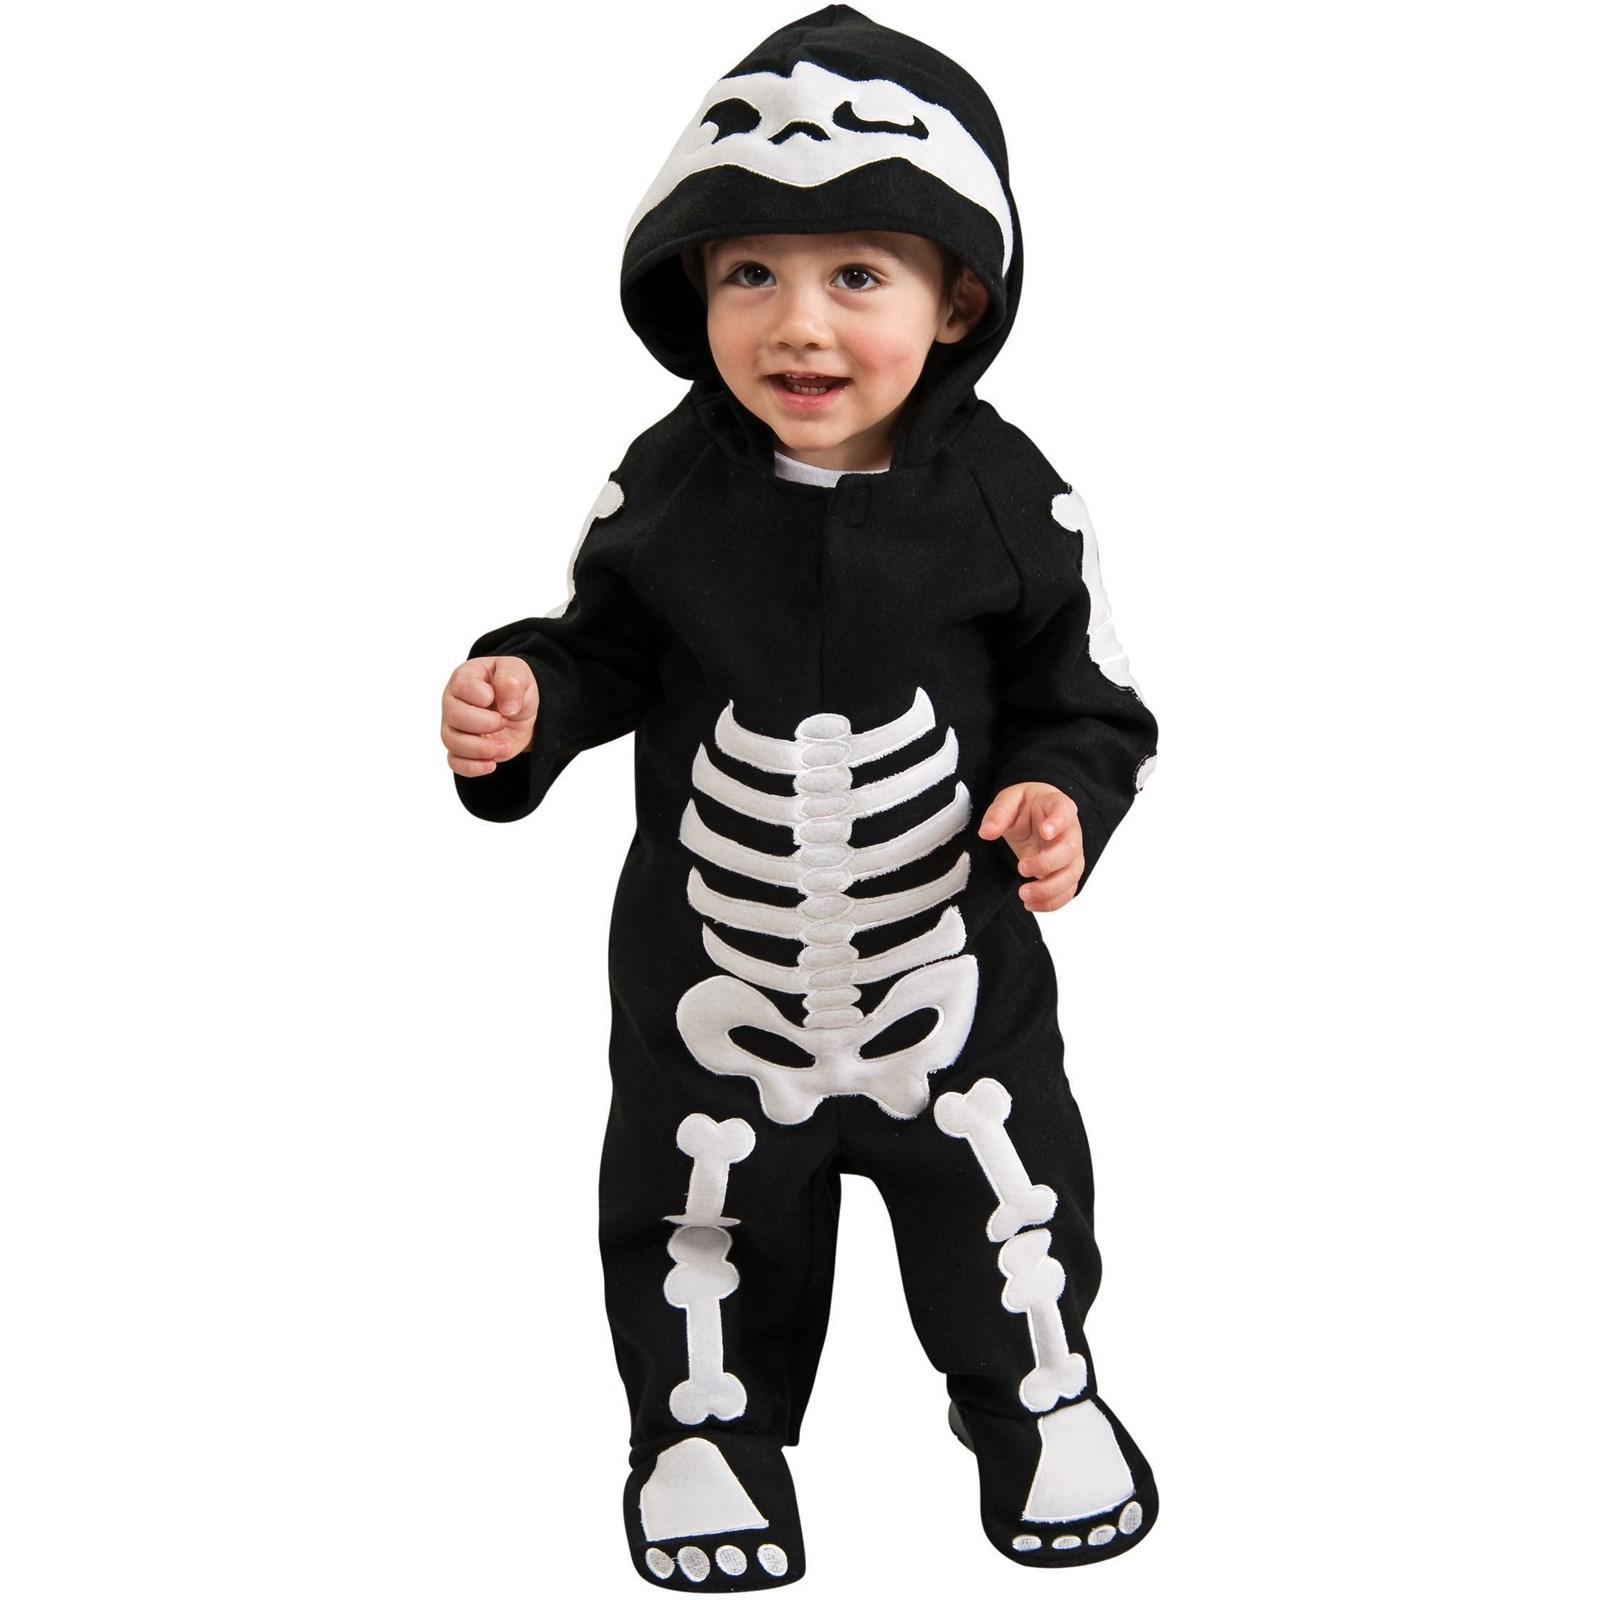 Skeleton Costumes | BuyCostumes.com